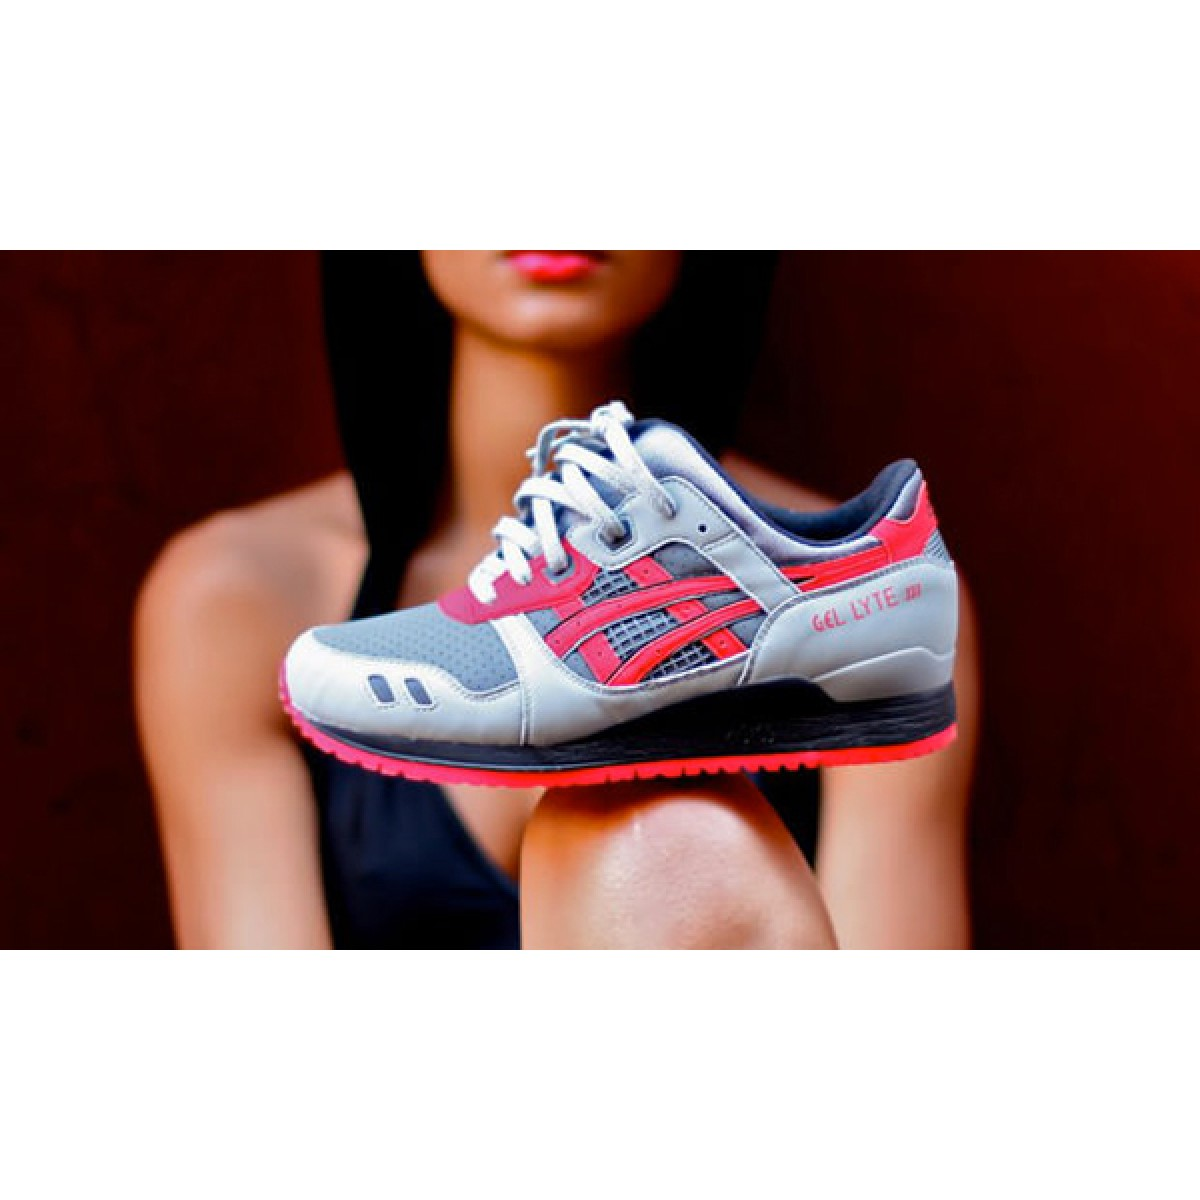 acheter chaussures asics femme